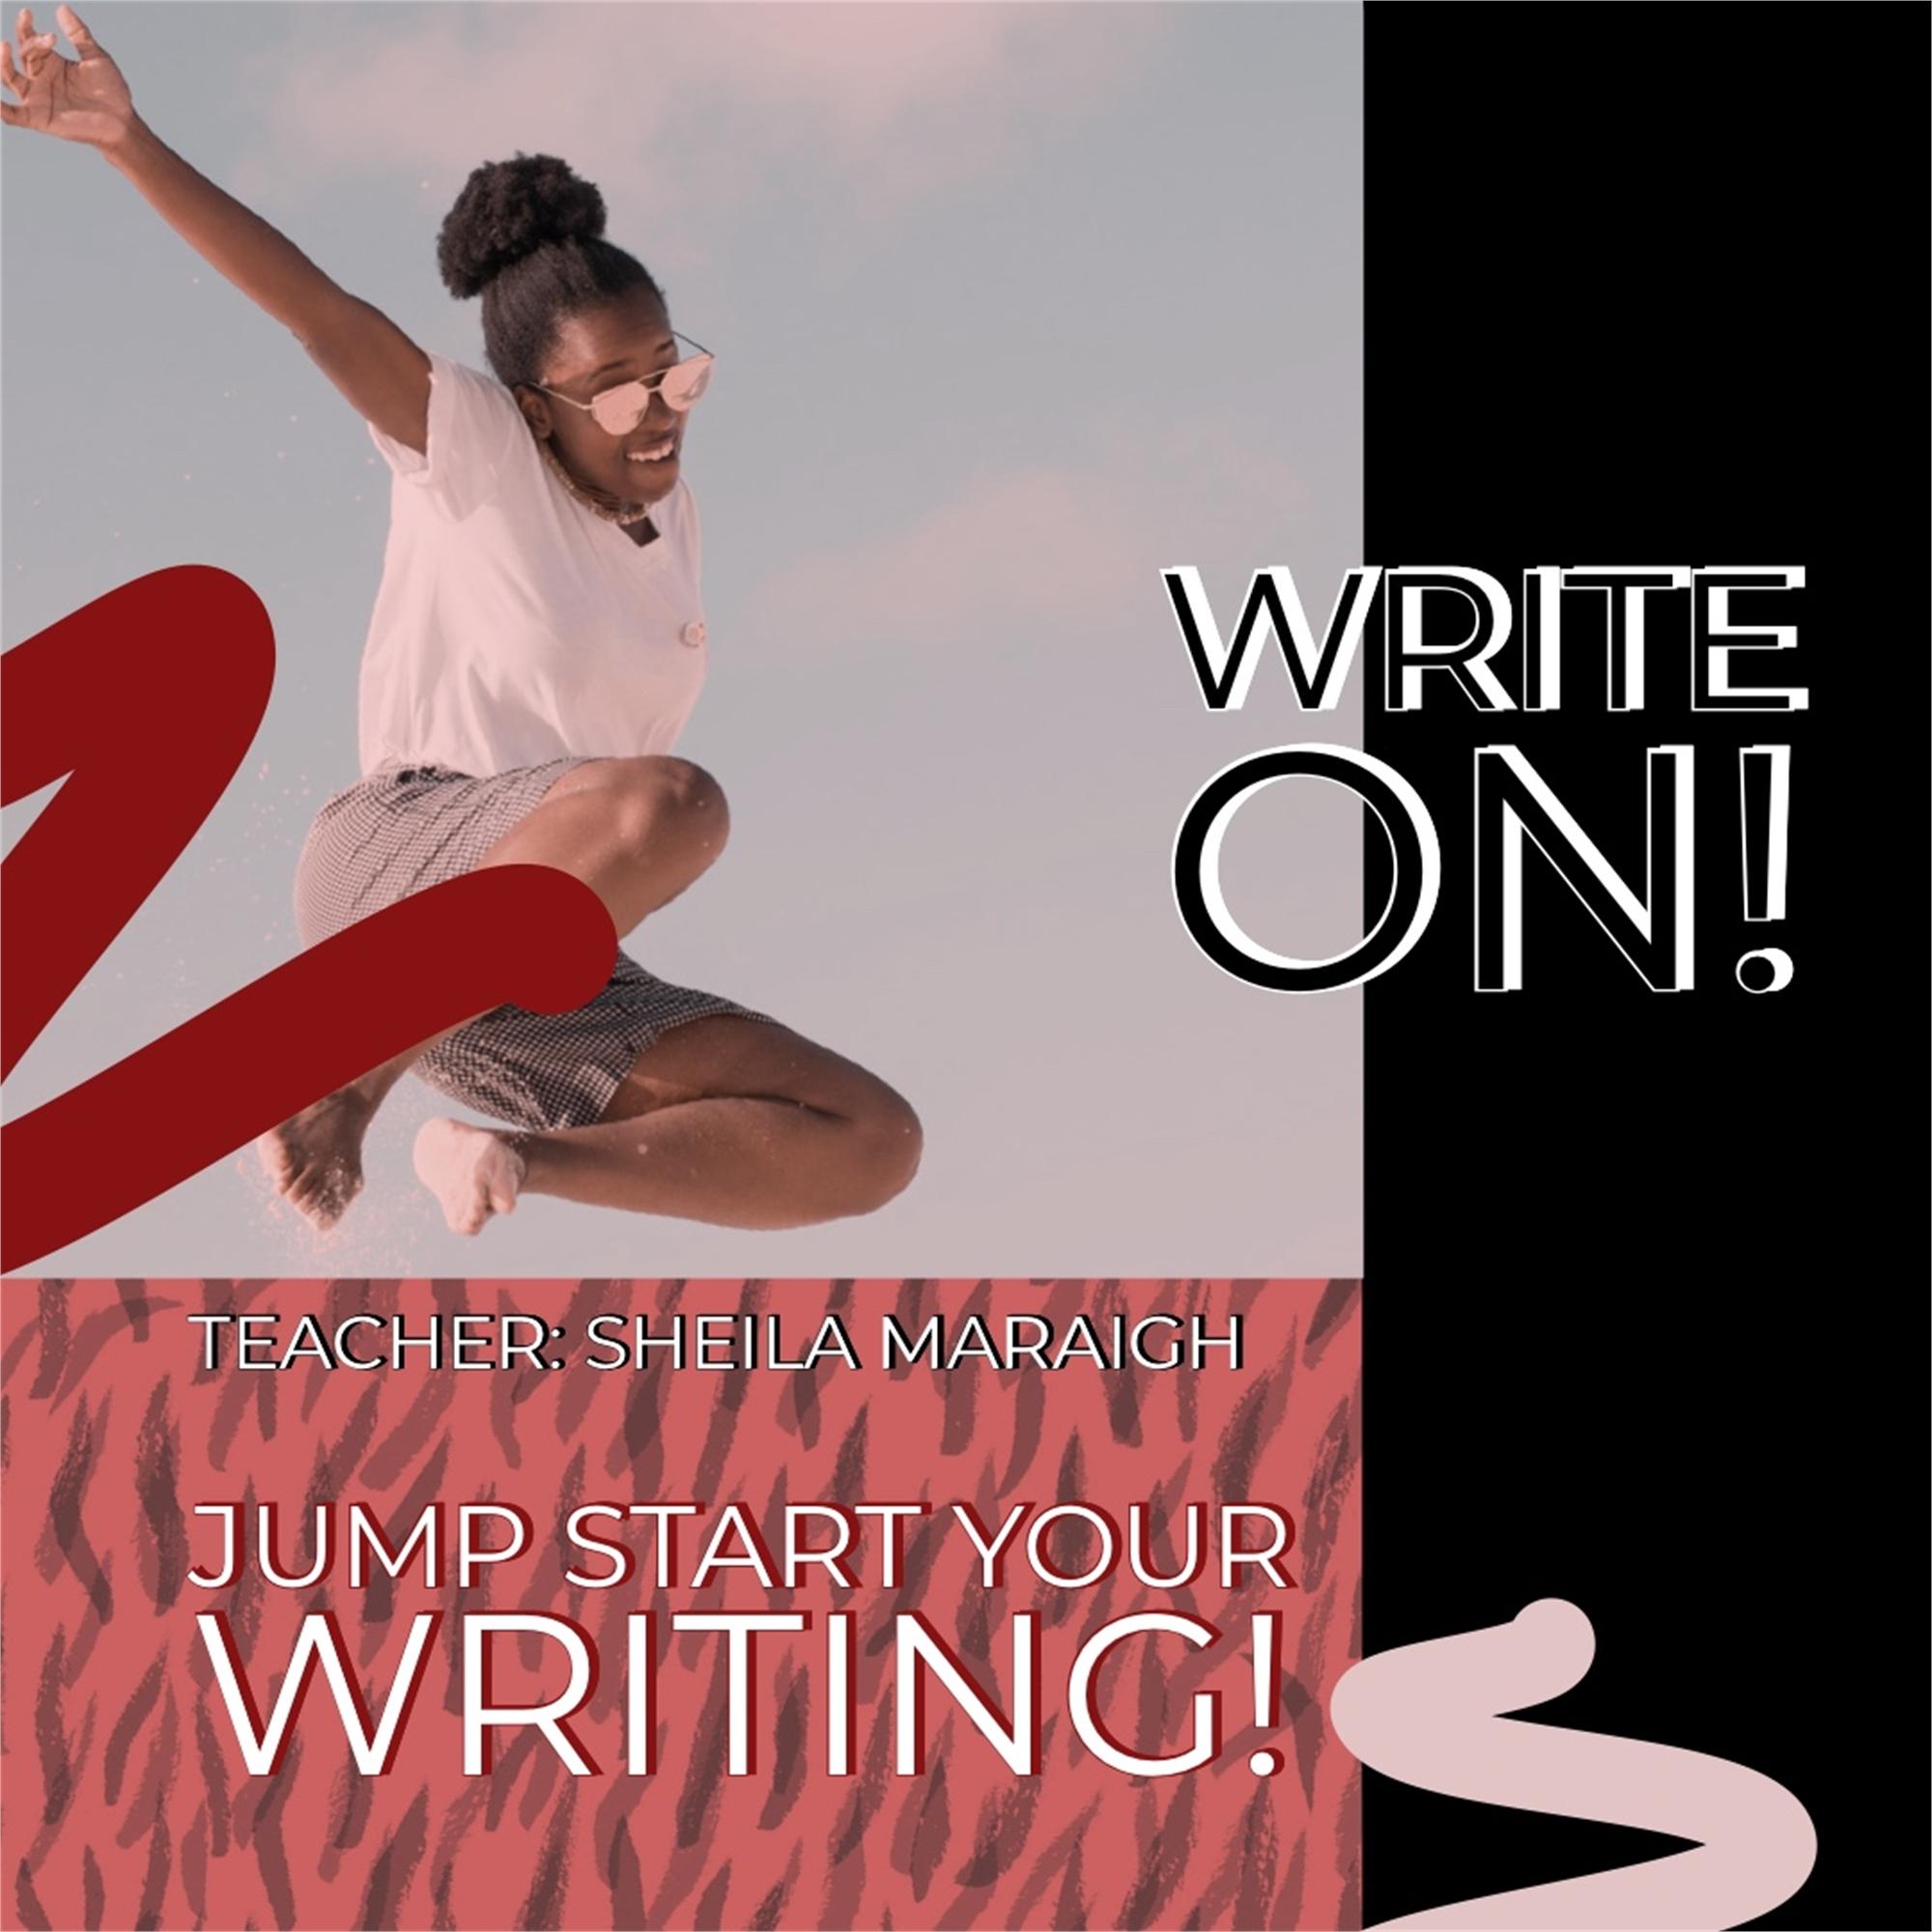 WRITE ON! Four Week, TUESDAY EVENING Class by Sheila Maraigh